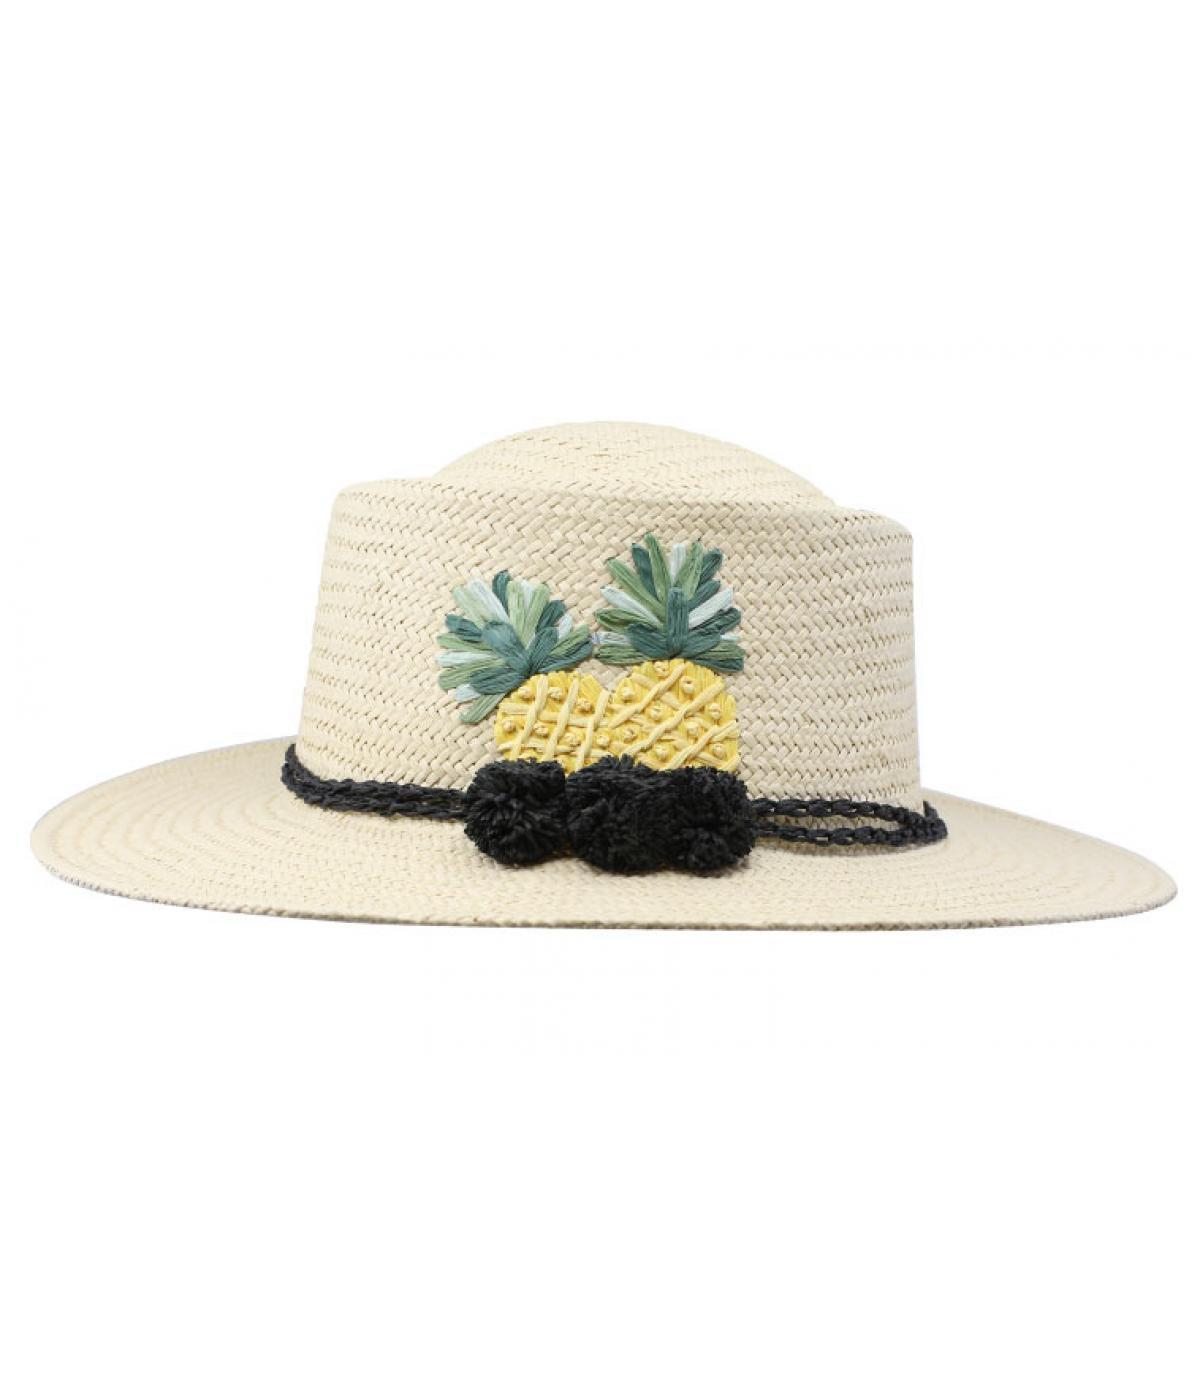 25bd98b48f8 Seeberger - Seeberger hats and scarves shop.